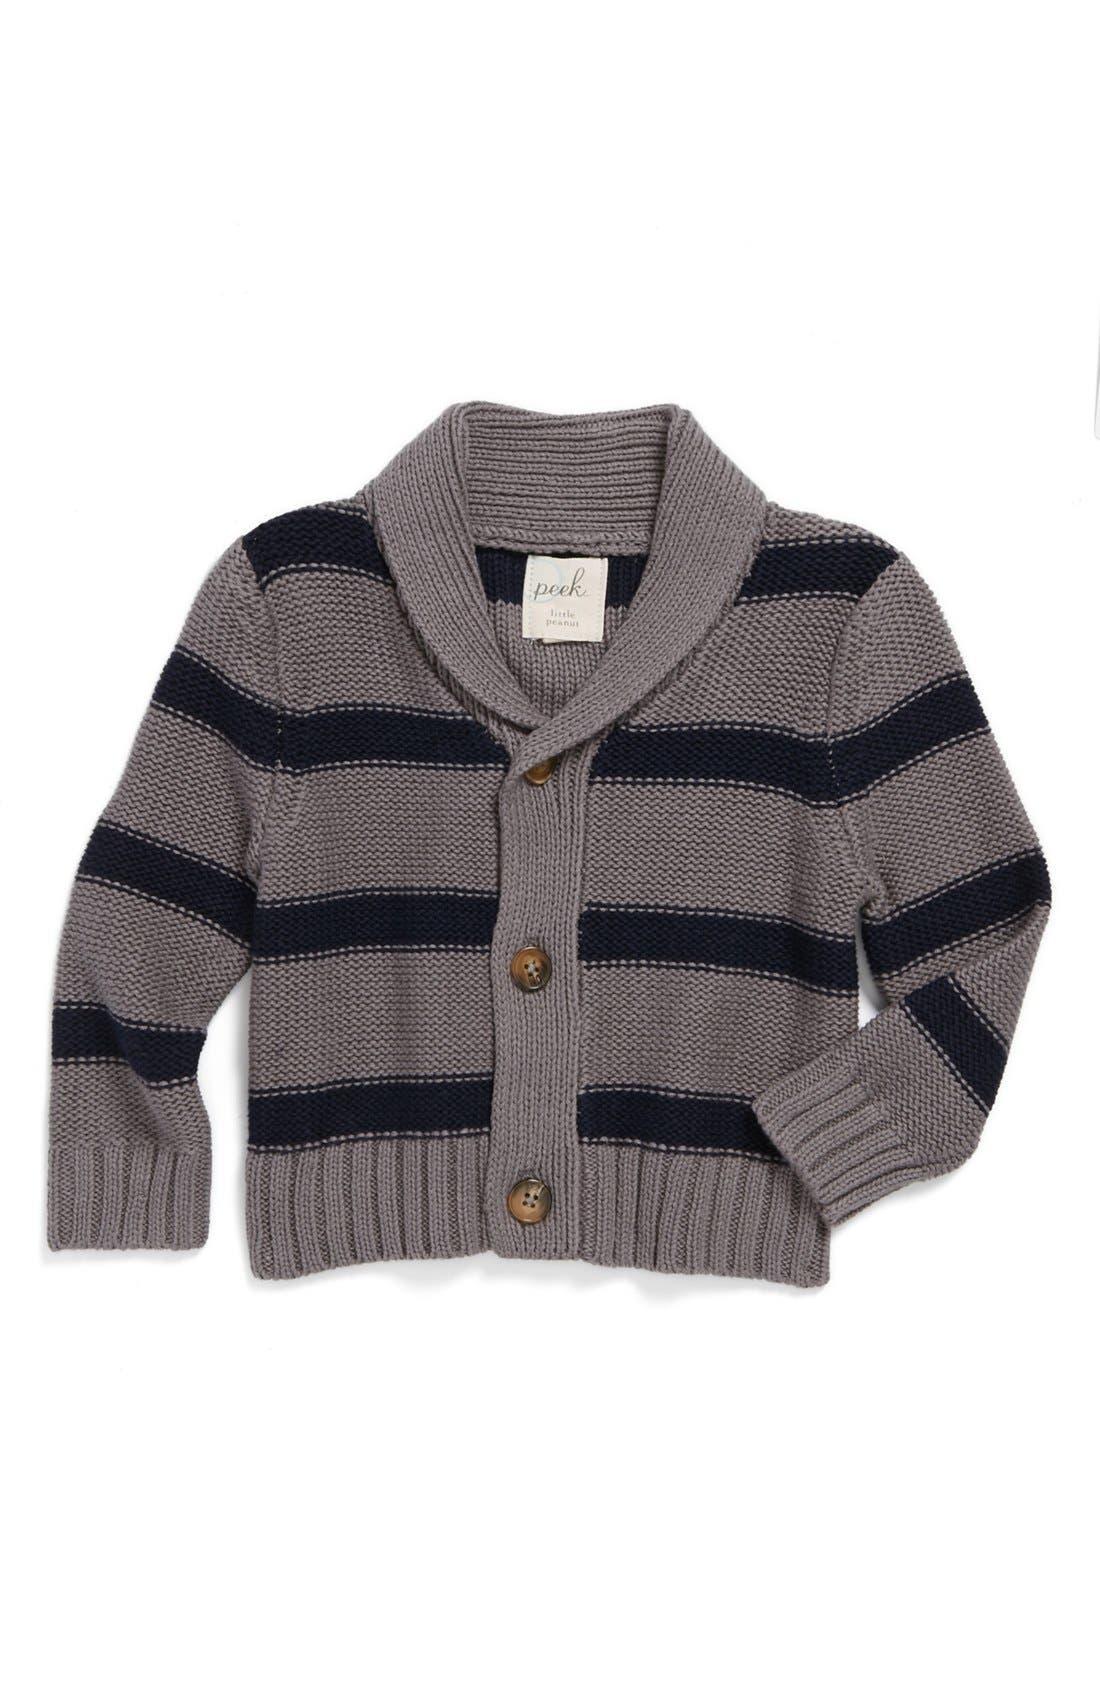 Alternate Image 1 Selected - Peek 'Highland' Stripe Cardigan (Baby Boys)